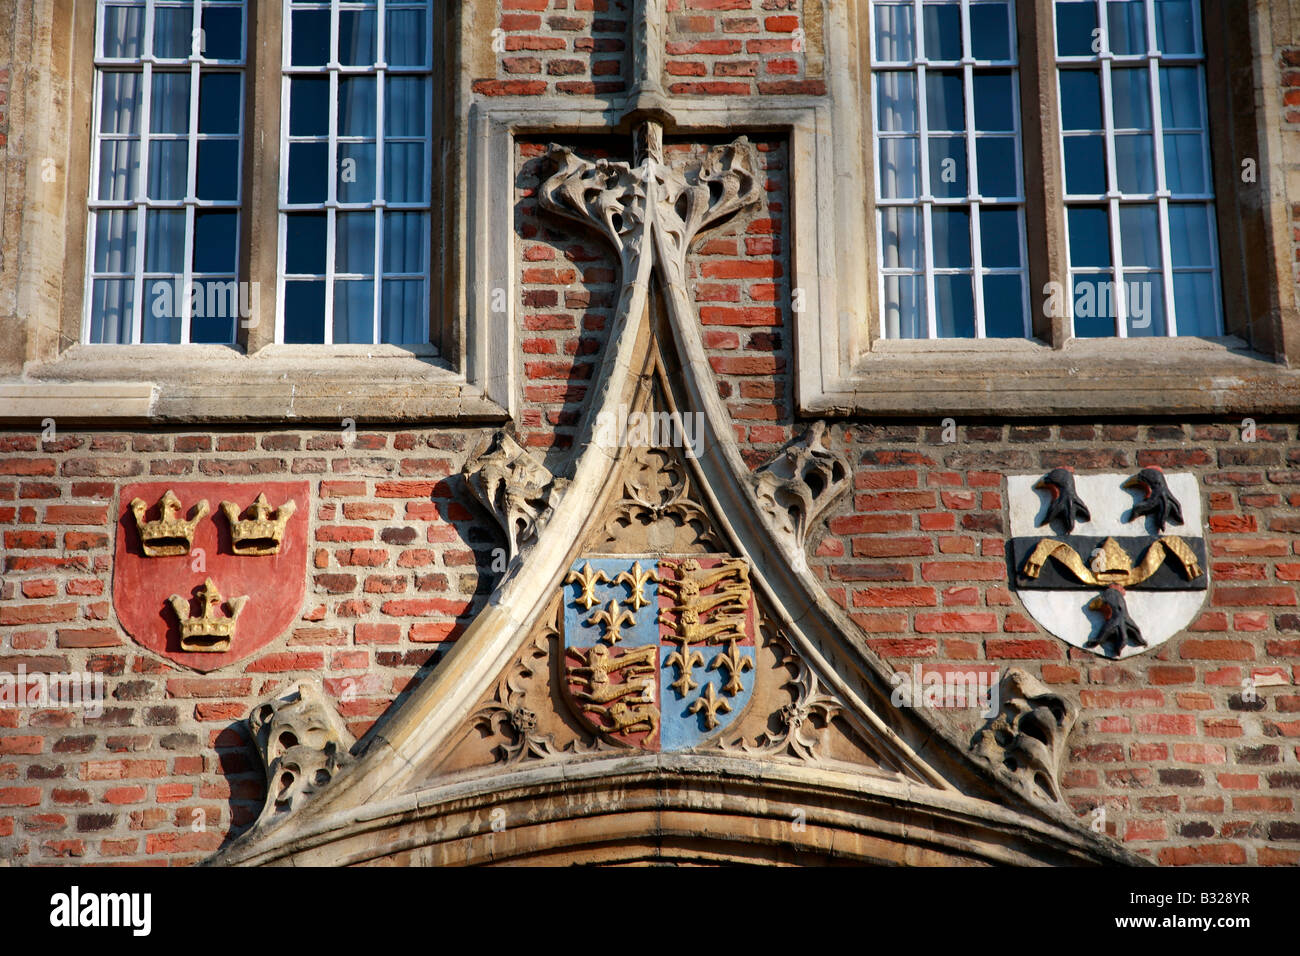 Coat of Arms Jesus College entrance gate University of Cambridge City Cambridgeshire England Britain UK - Stock Image